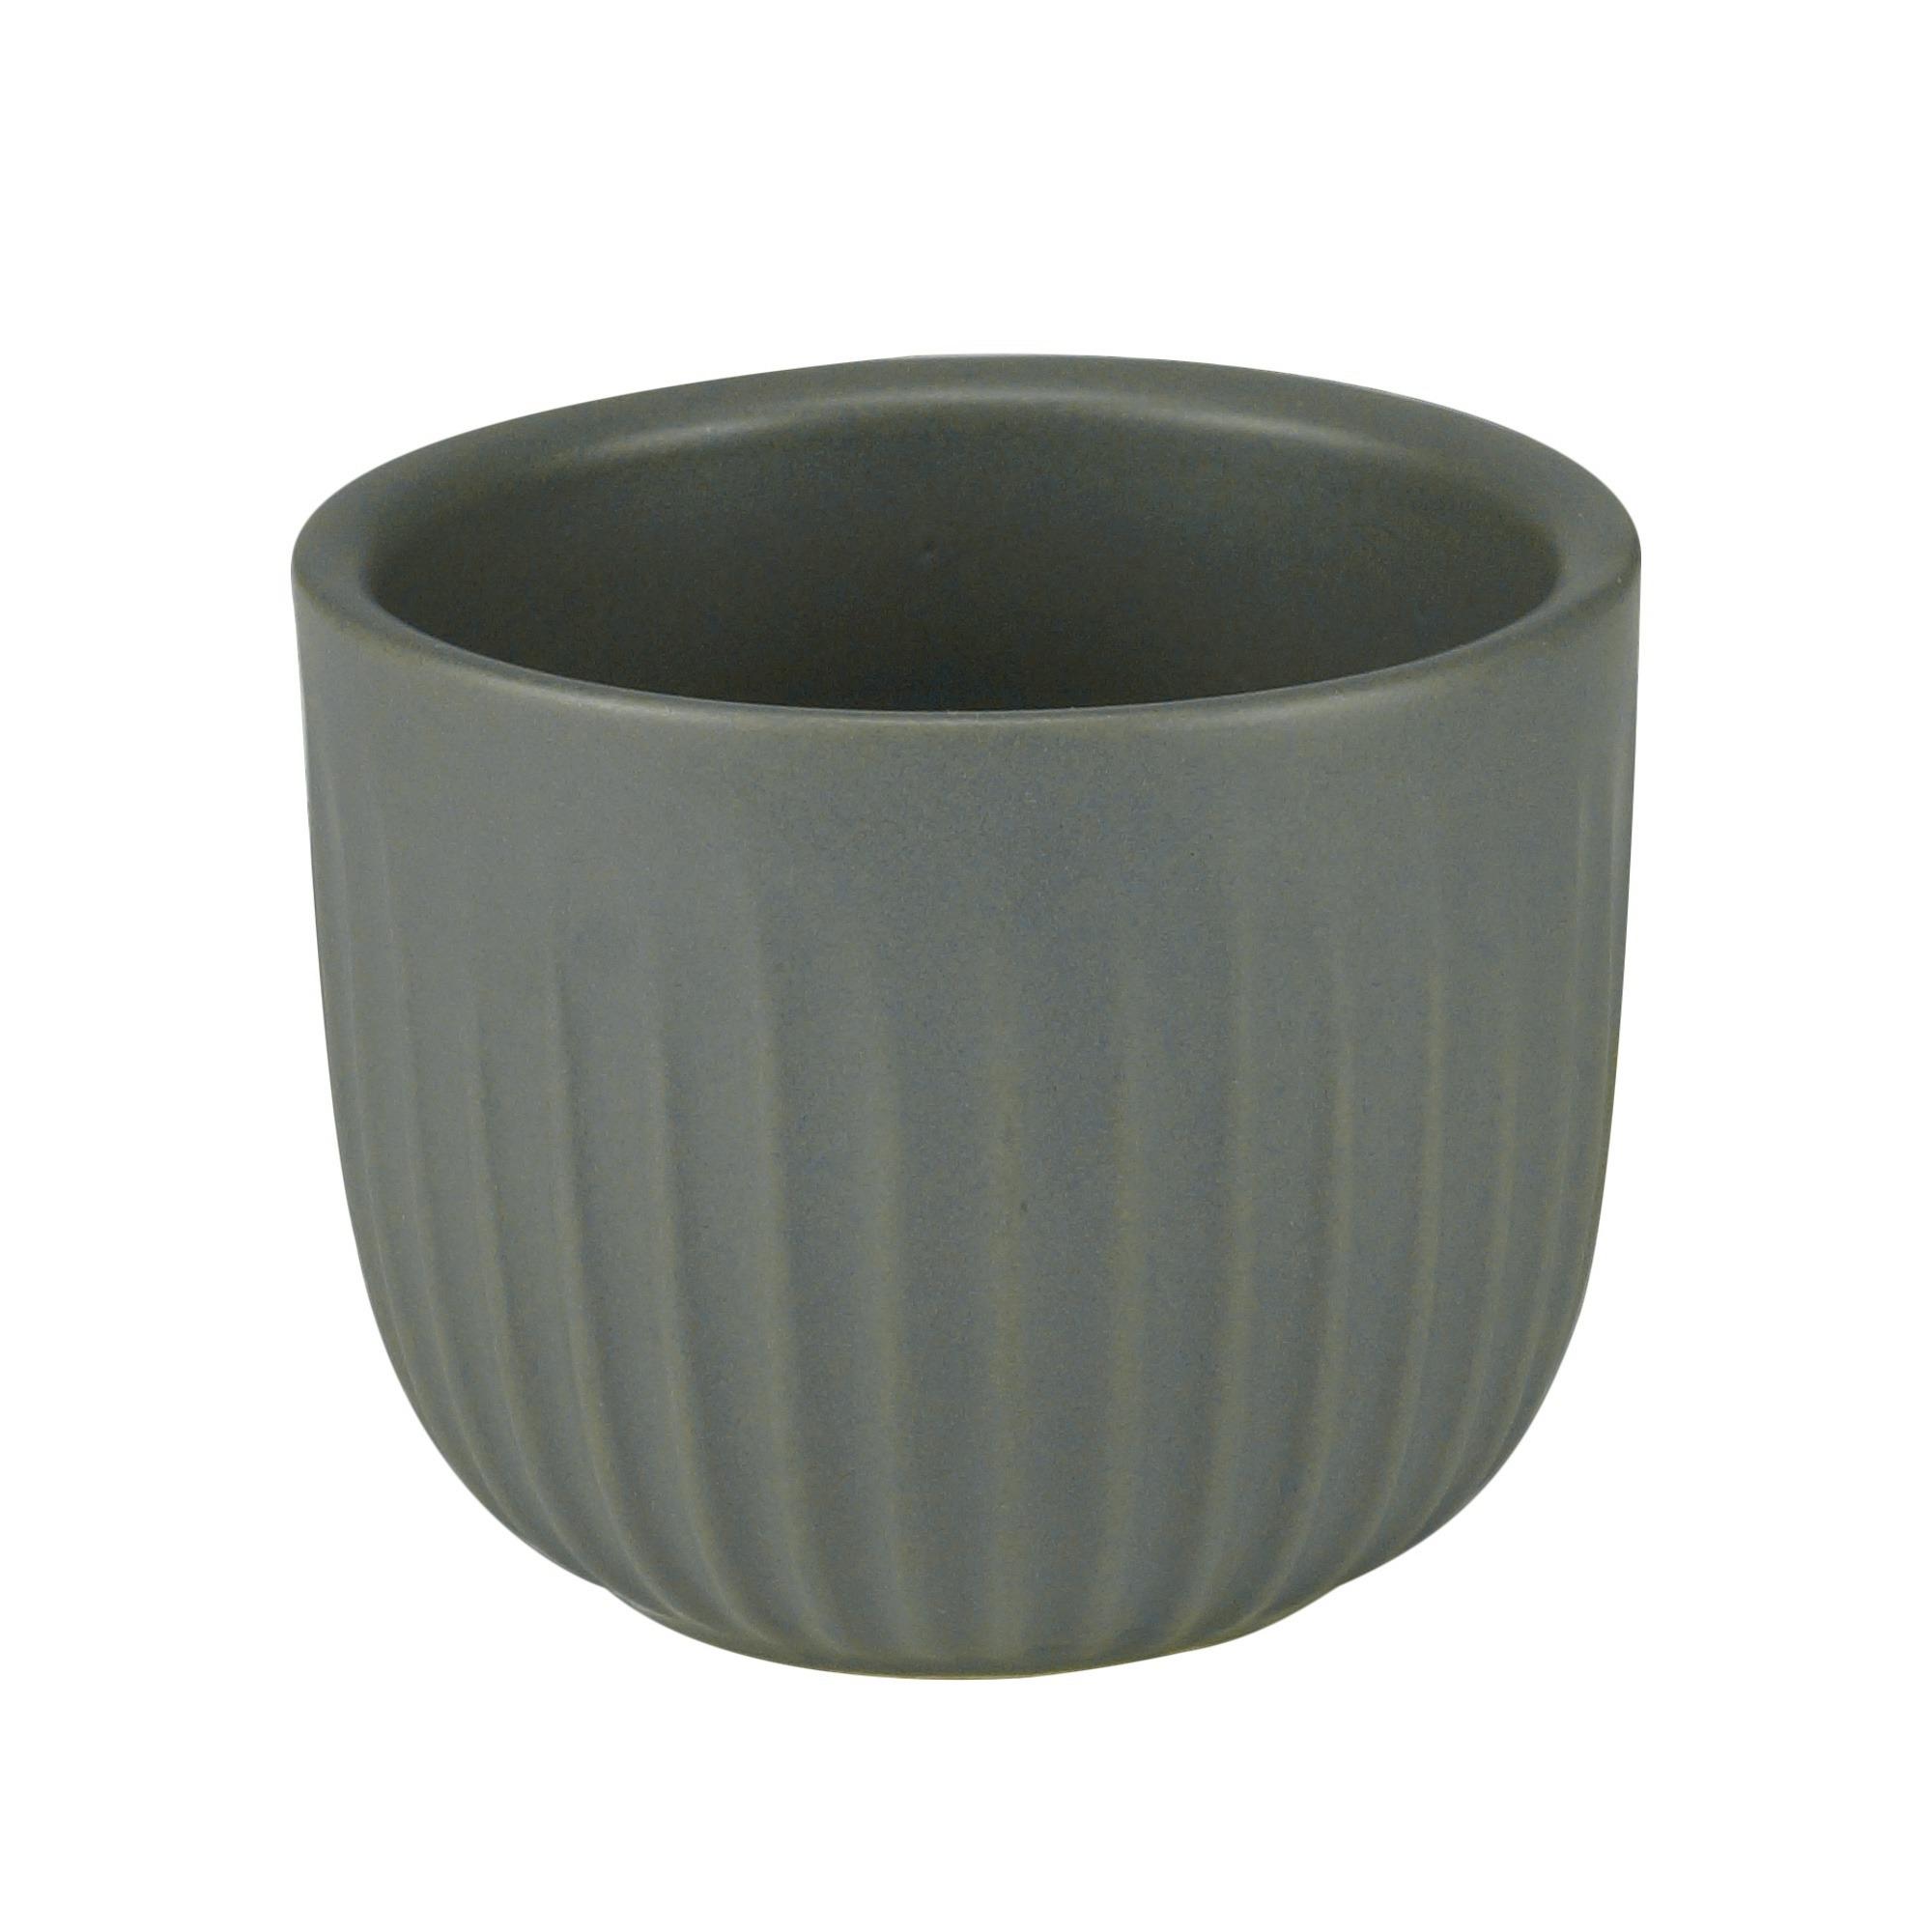 Cachepot Redondo de Ceramica Matte Groove 6cm Cinza - Urban